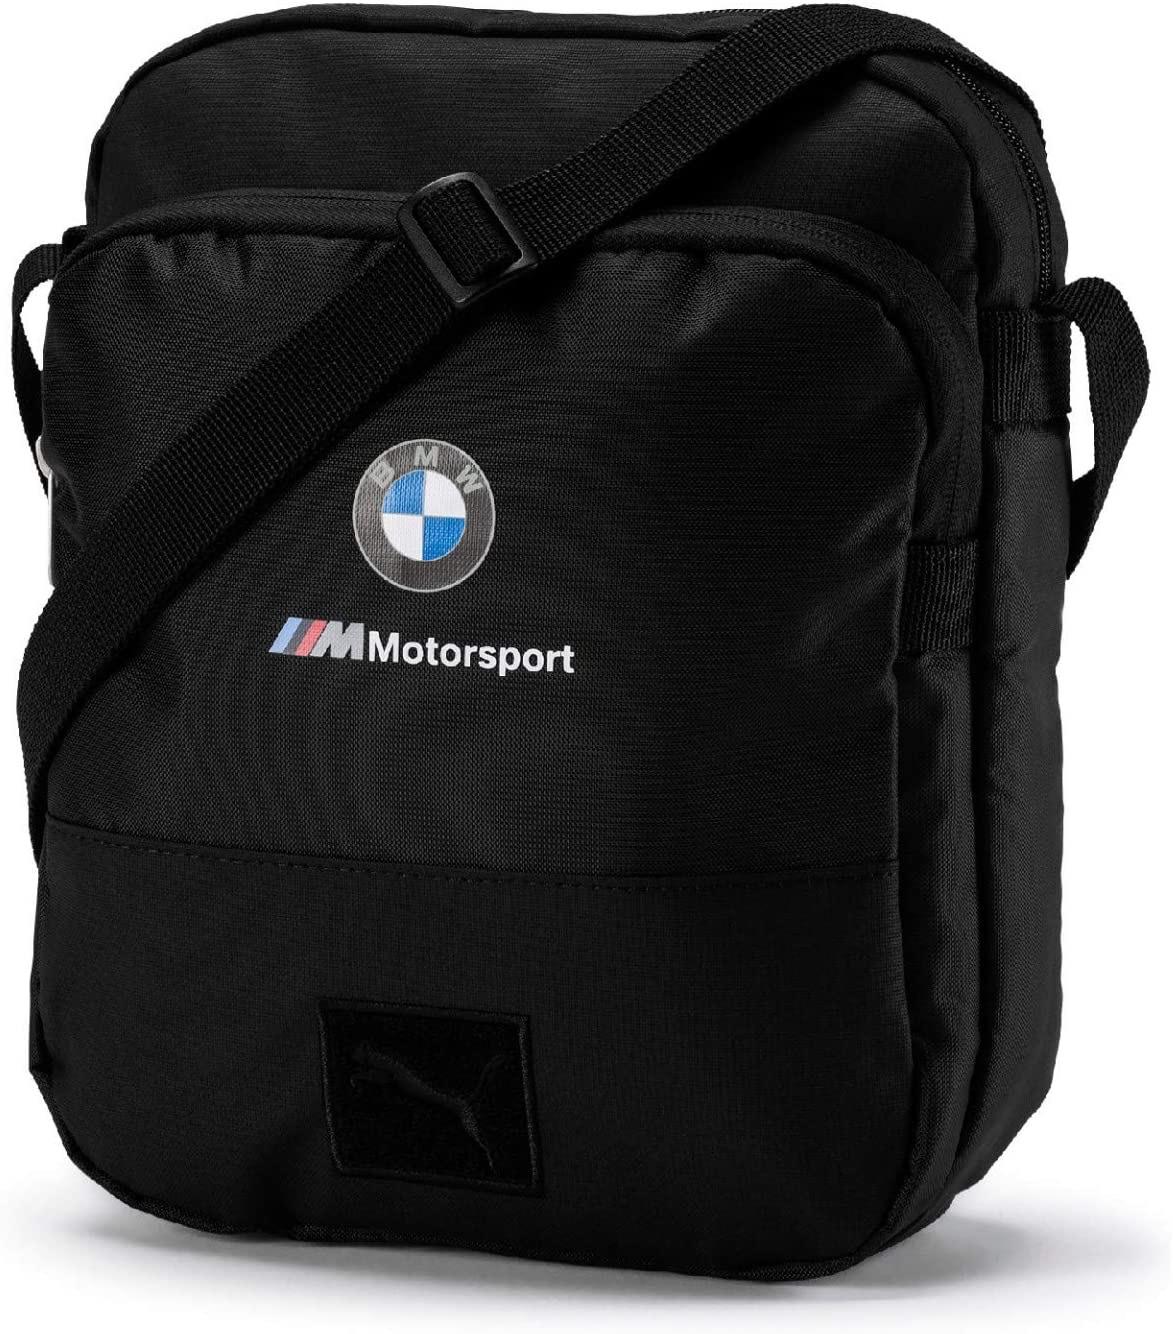 Grand sac à bandoulière Puma X BMW M Motorsport